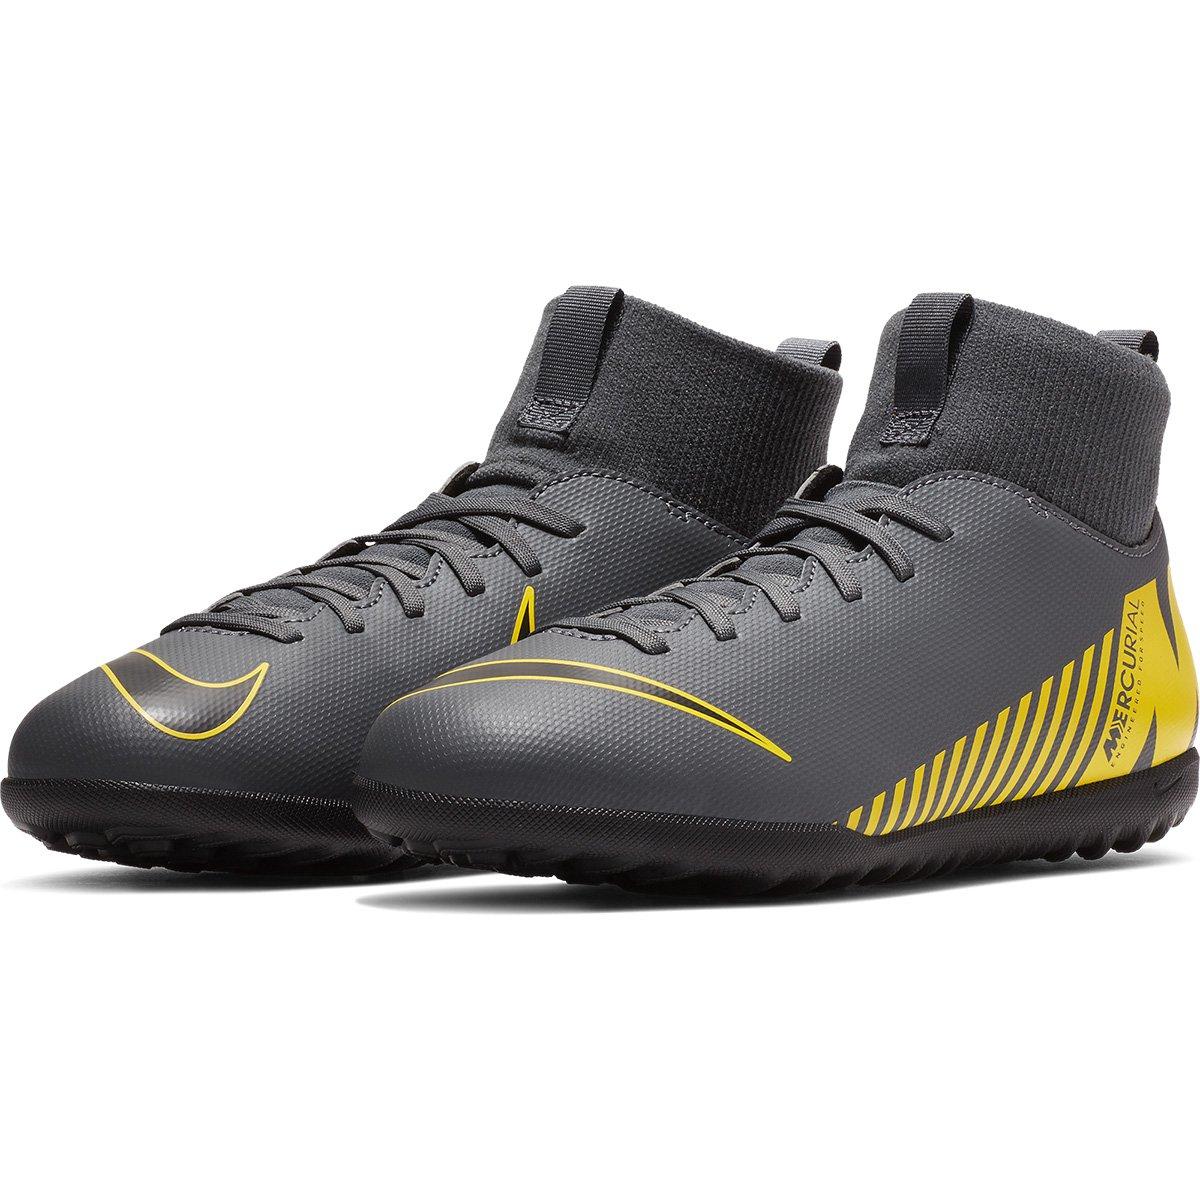 922d0bb1c2f Chuteira Society Infantil Nike Mercurial Superfly 6 Club TF - Cinza e  Amarelo - Compre Agora